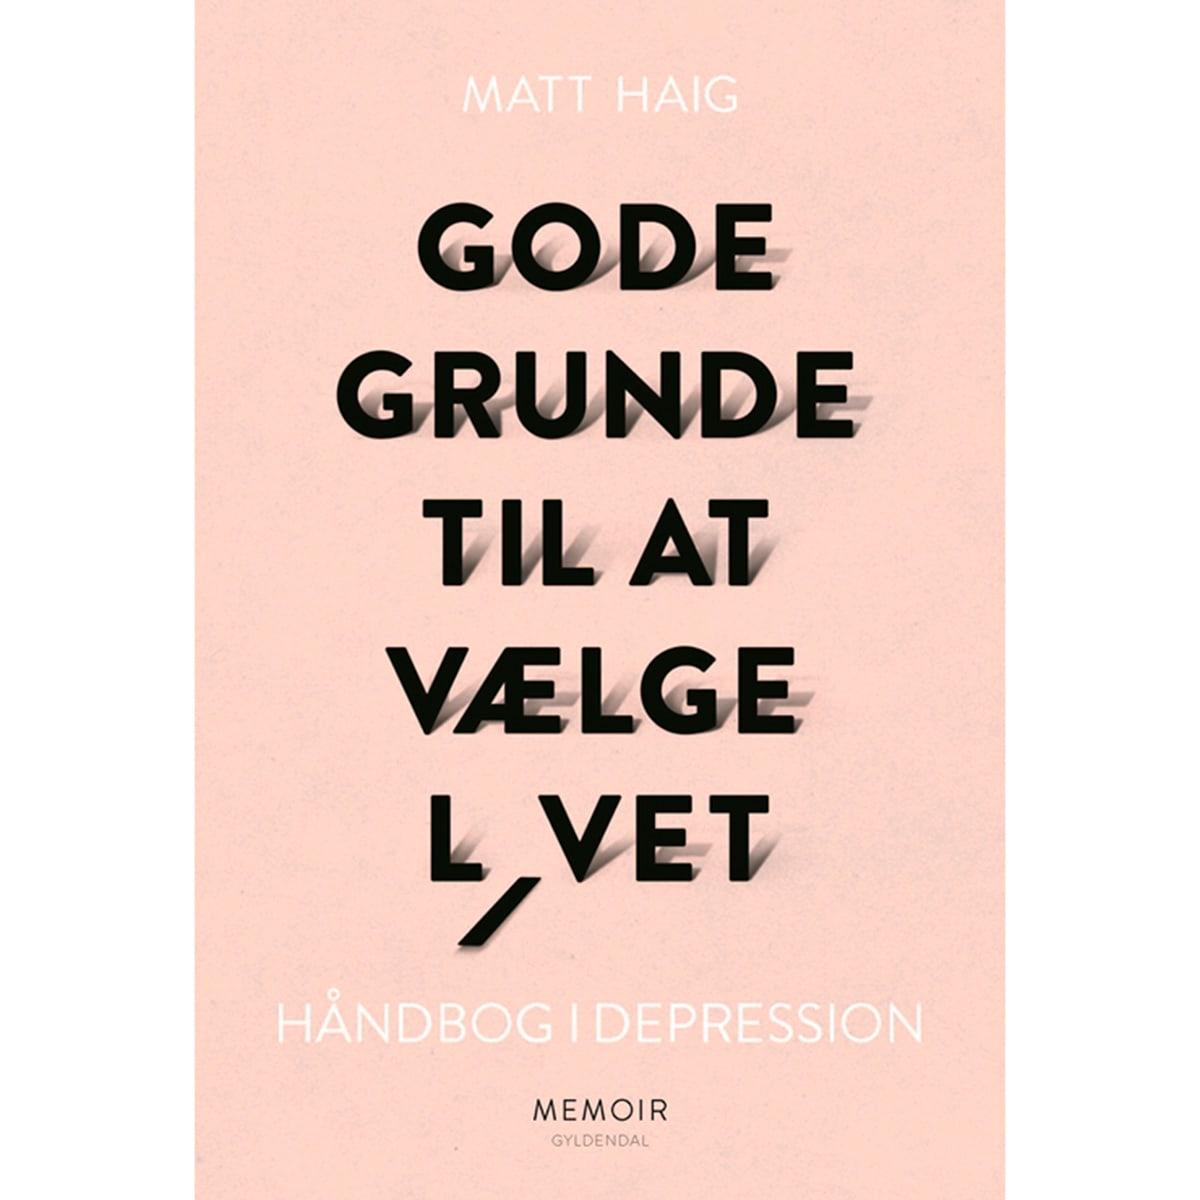 Af Matt Haig